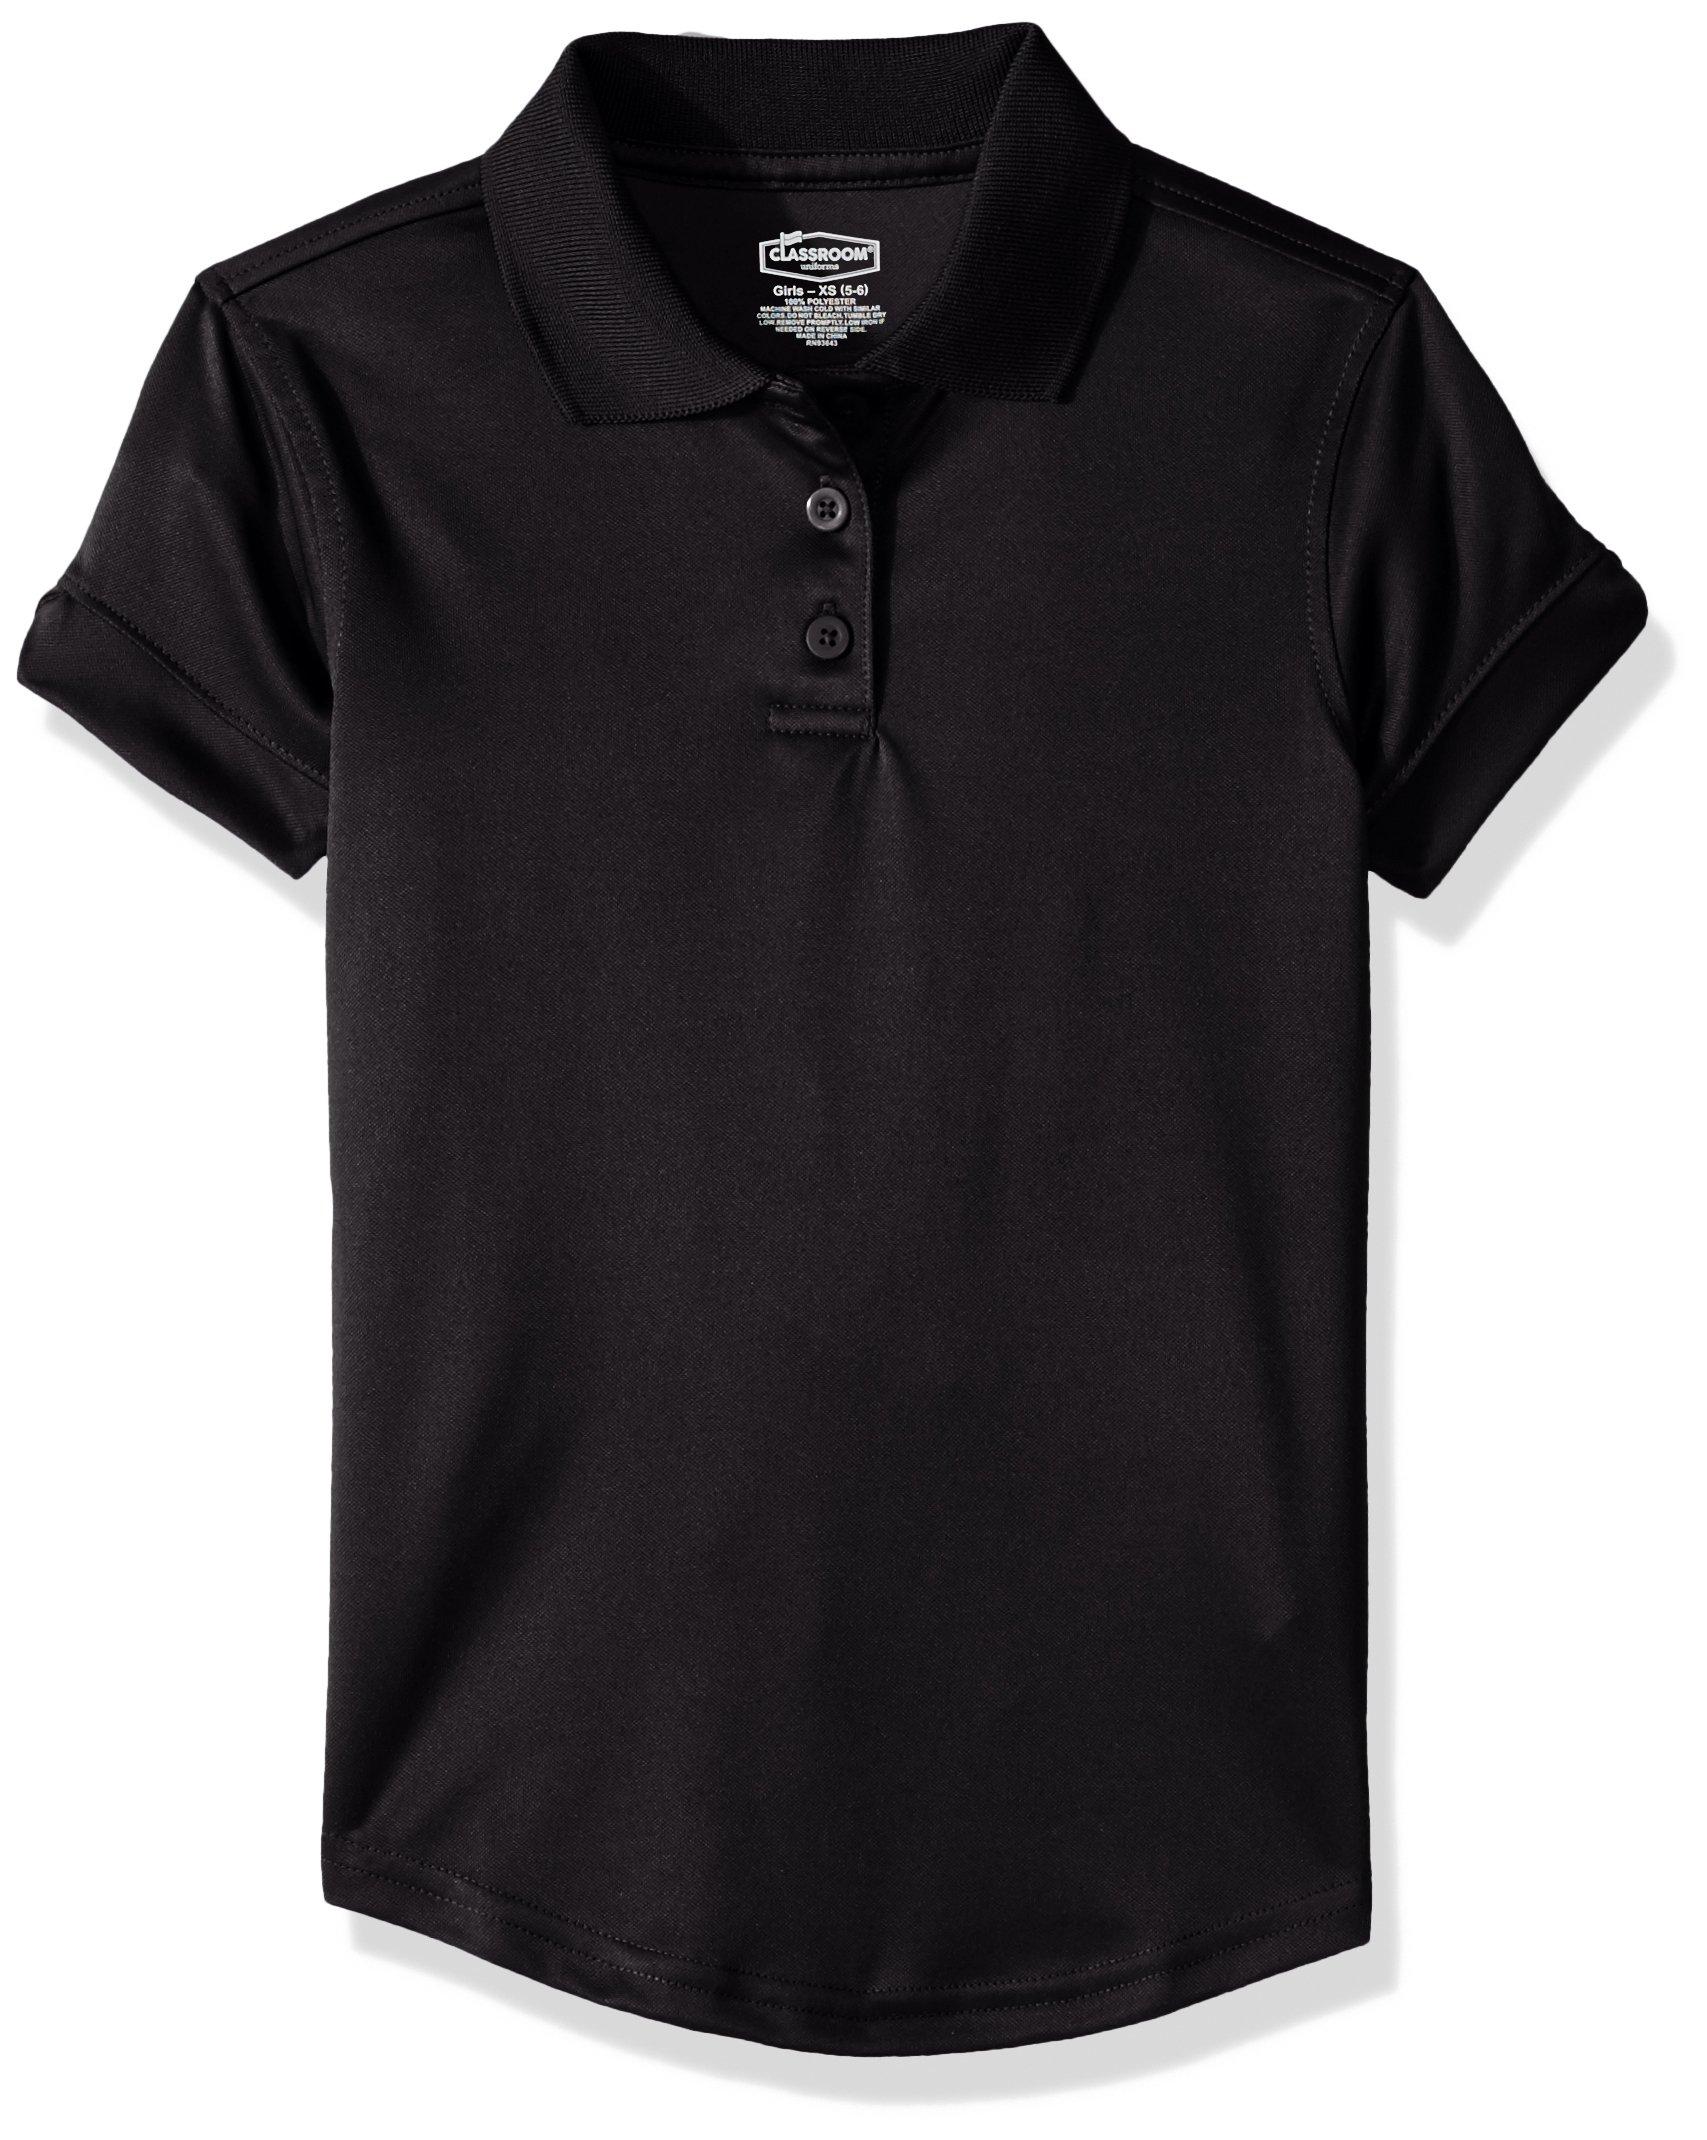 Classroom School Uniforms Big Girls Fit Moisture Wicking Polo, sos Black, XL by Classroom School Uniforms (Image #1)